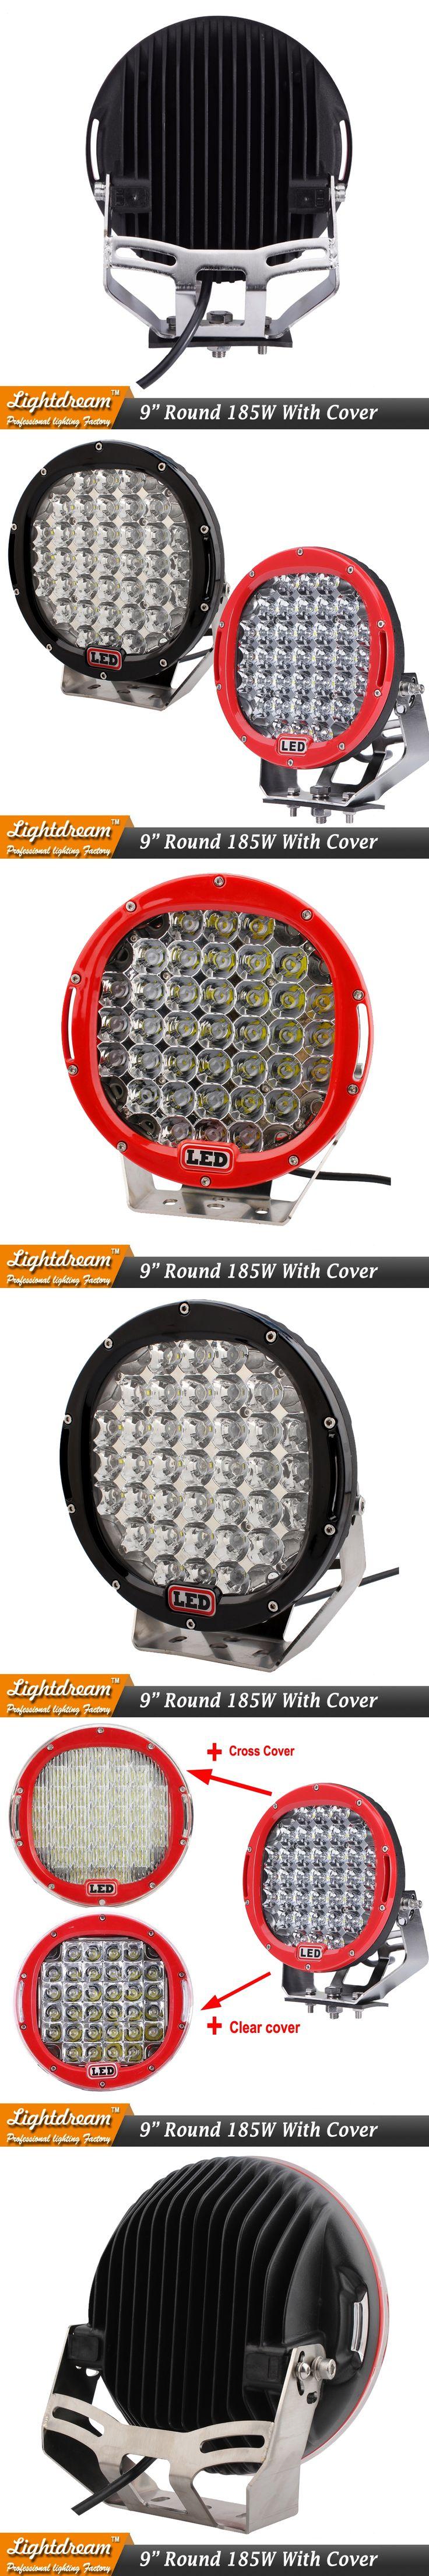 The 33 Best Led Headlight Kits Images On Pinterest Headlights Lamp Lightings Gt Wholesale Lamps 5mm Leds Arb 185w Work Light Red Black 12v 24v Offroad Fog Drive